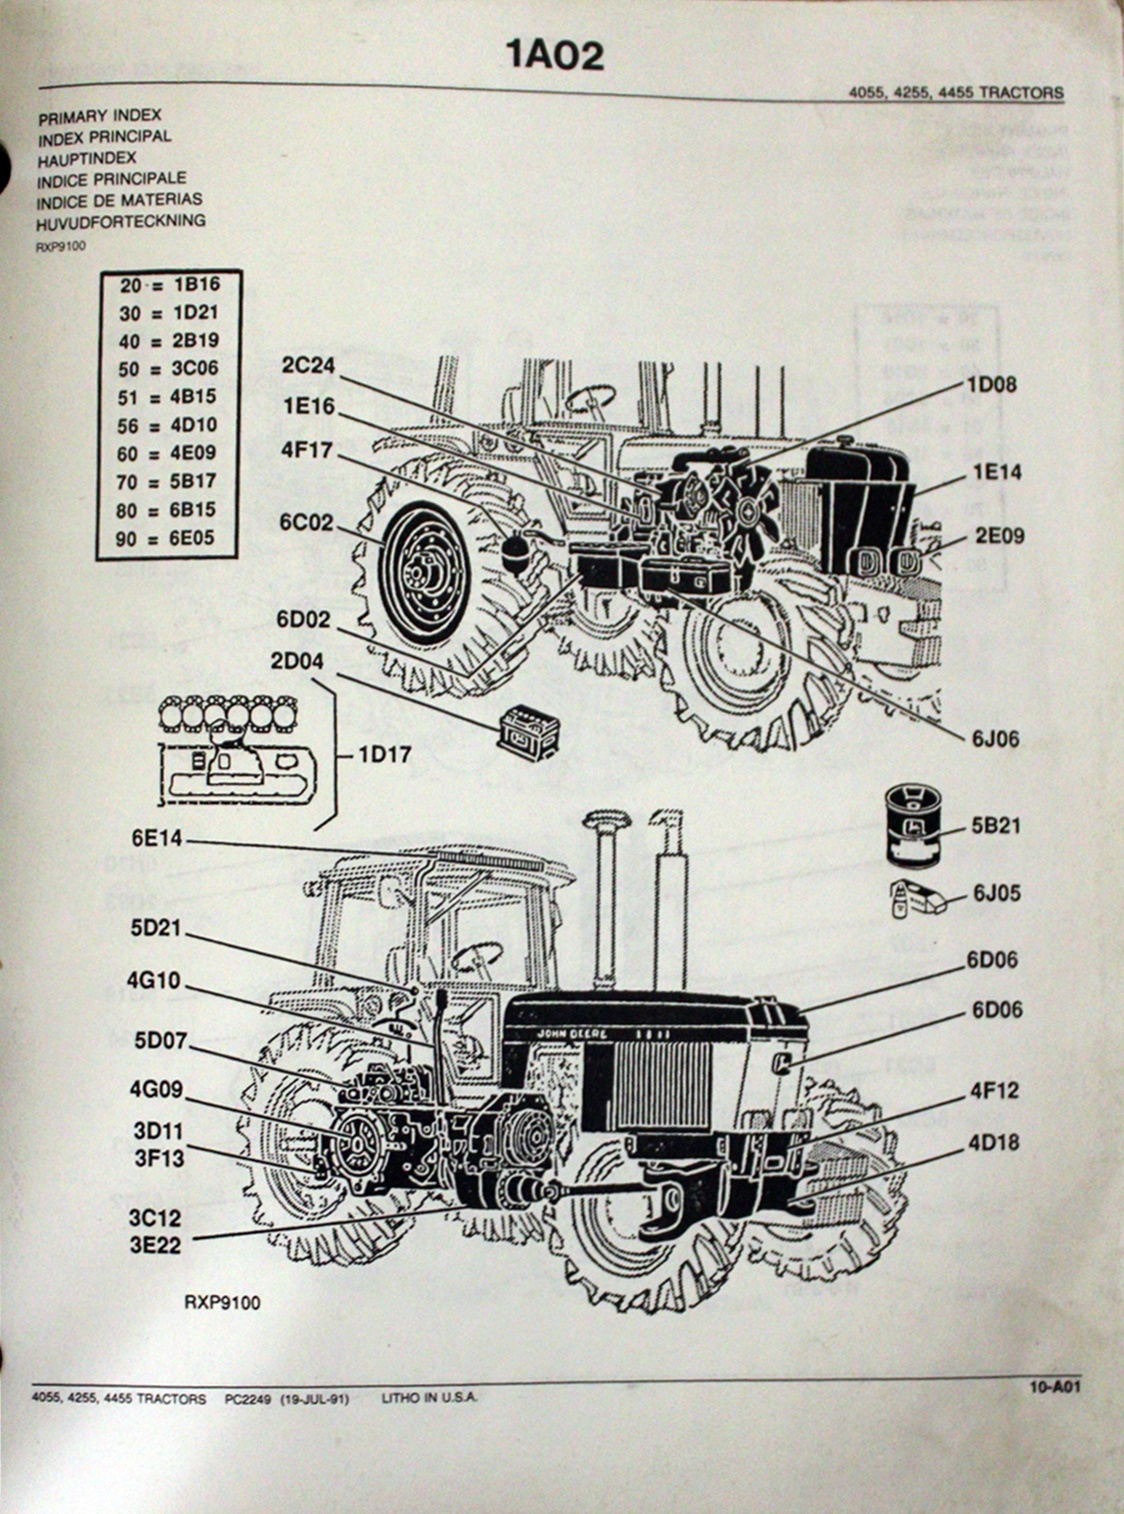 Ersatzteilekatalog John Deere Traktoren 4055, 4255 und 4455